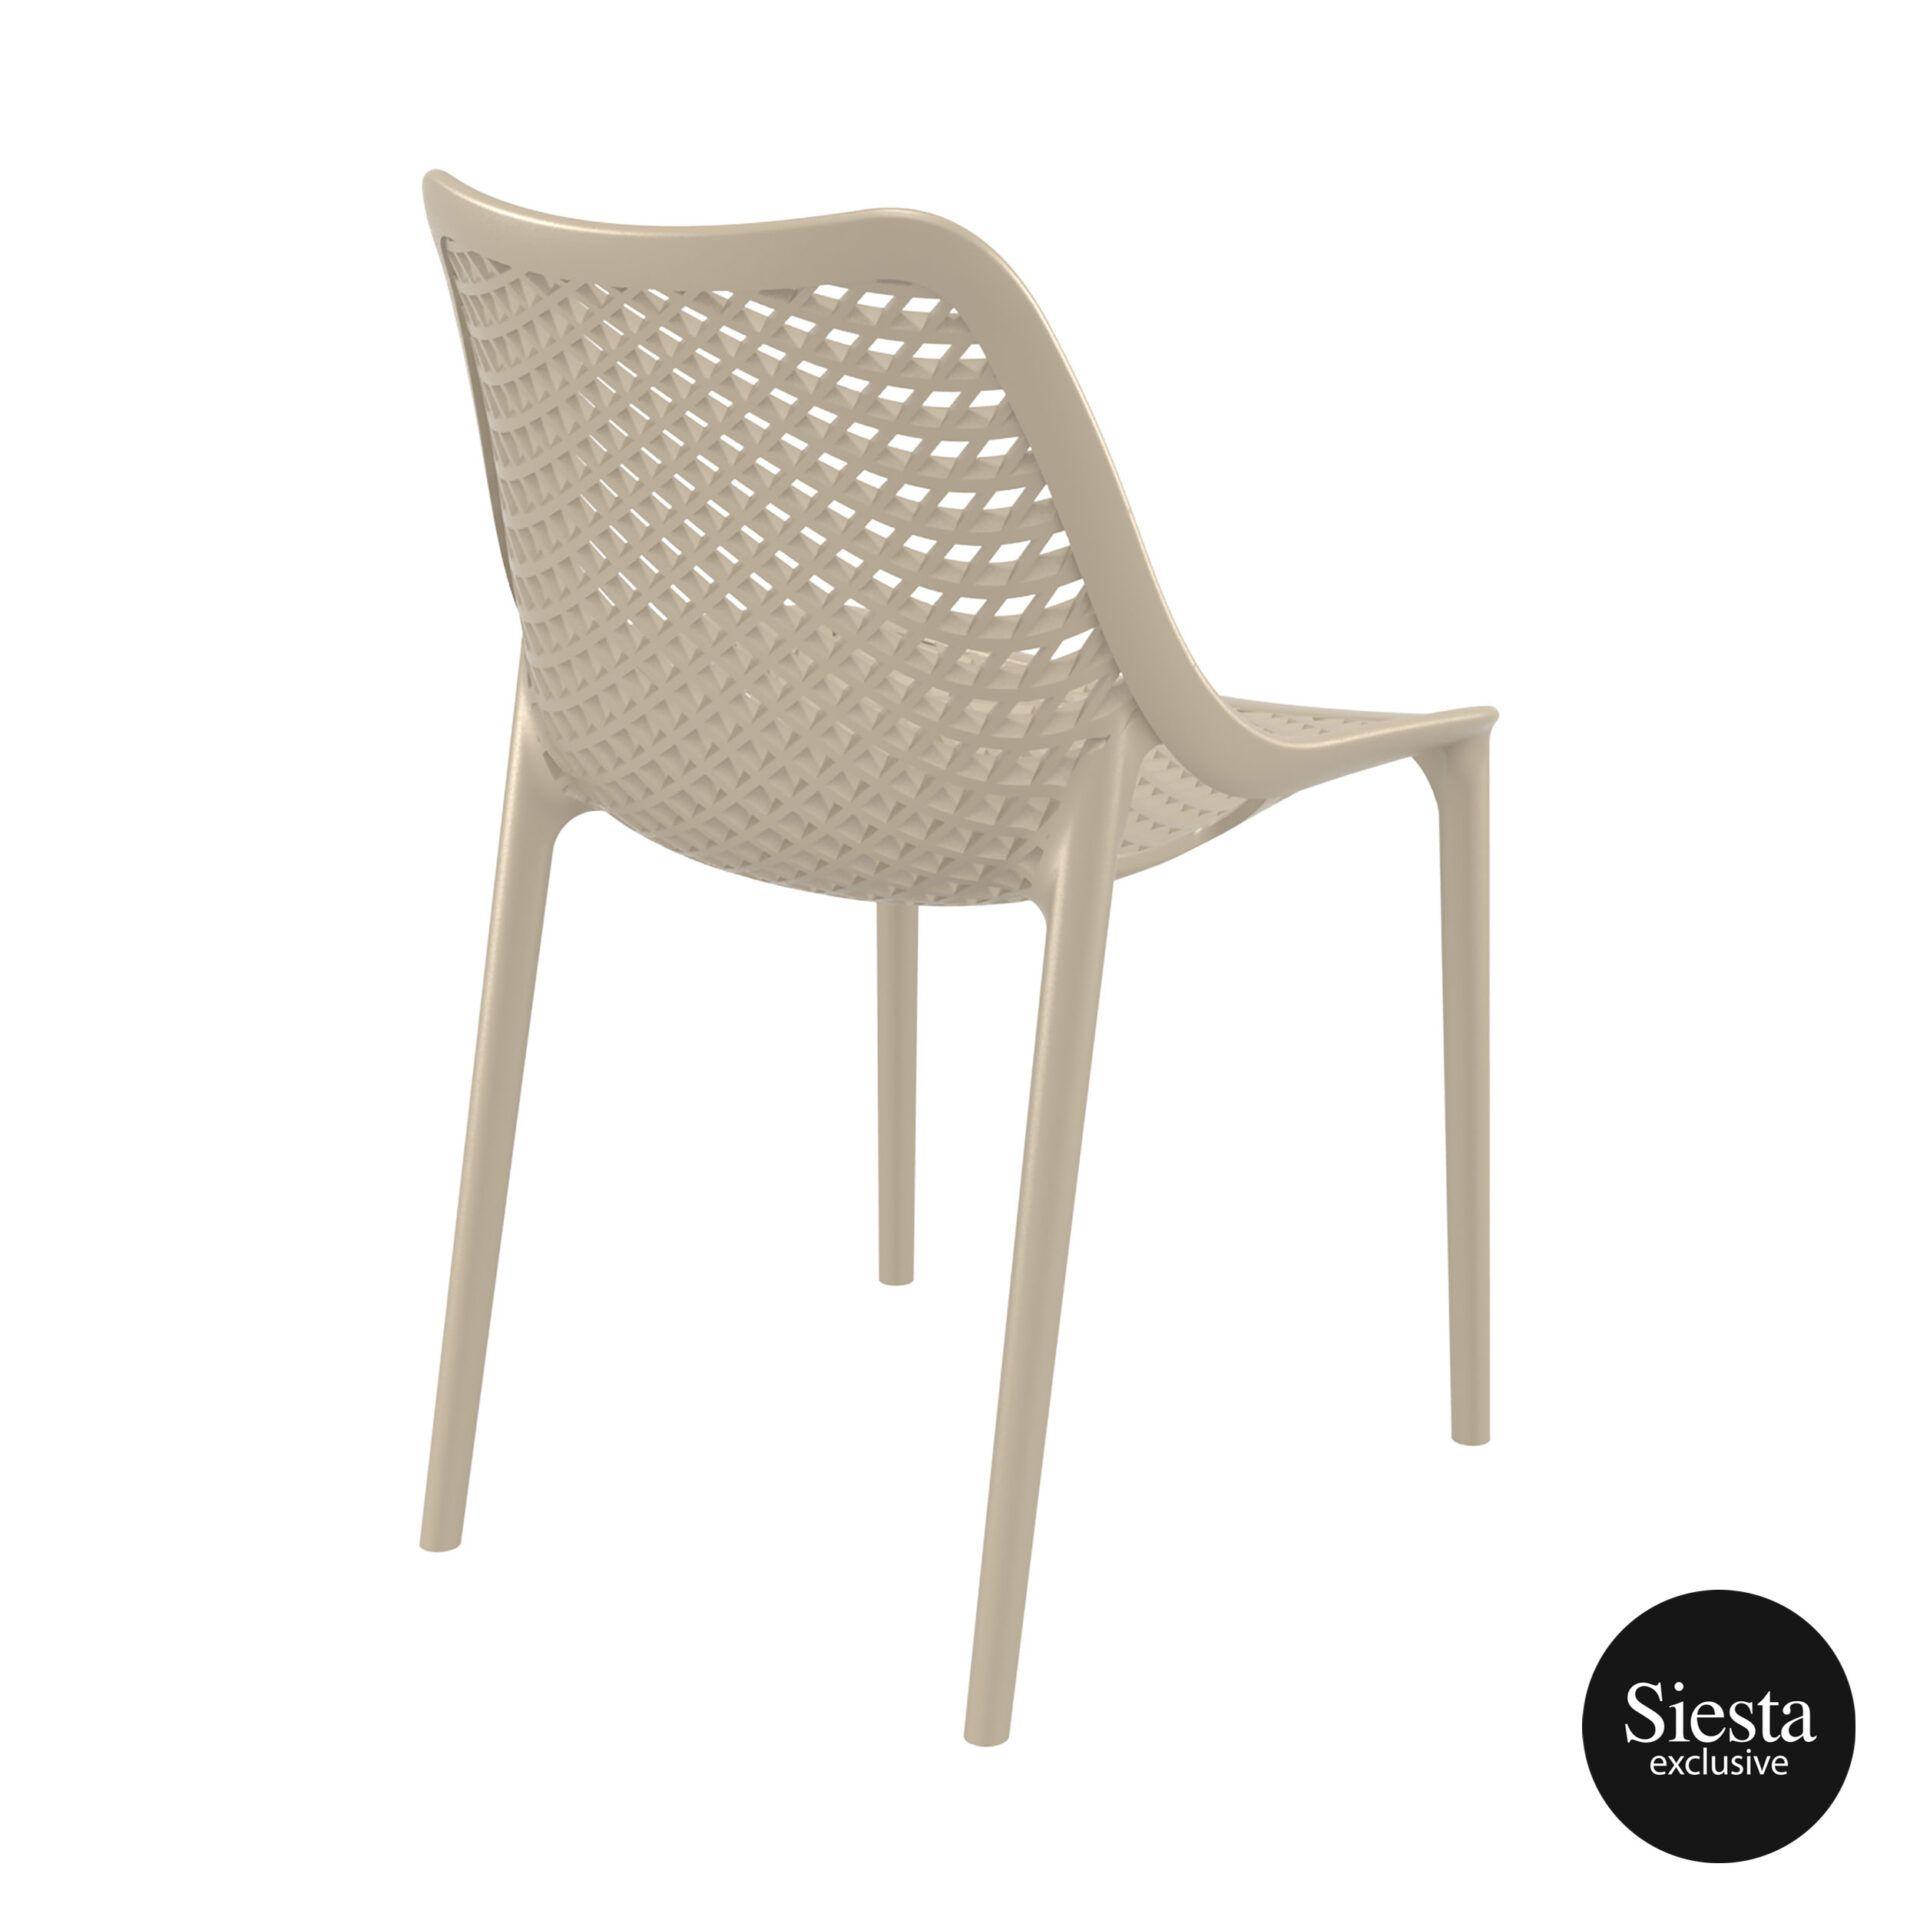 original siesta air chair dovegrey back side 1